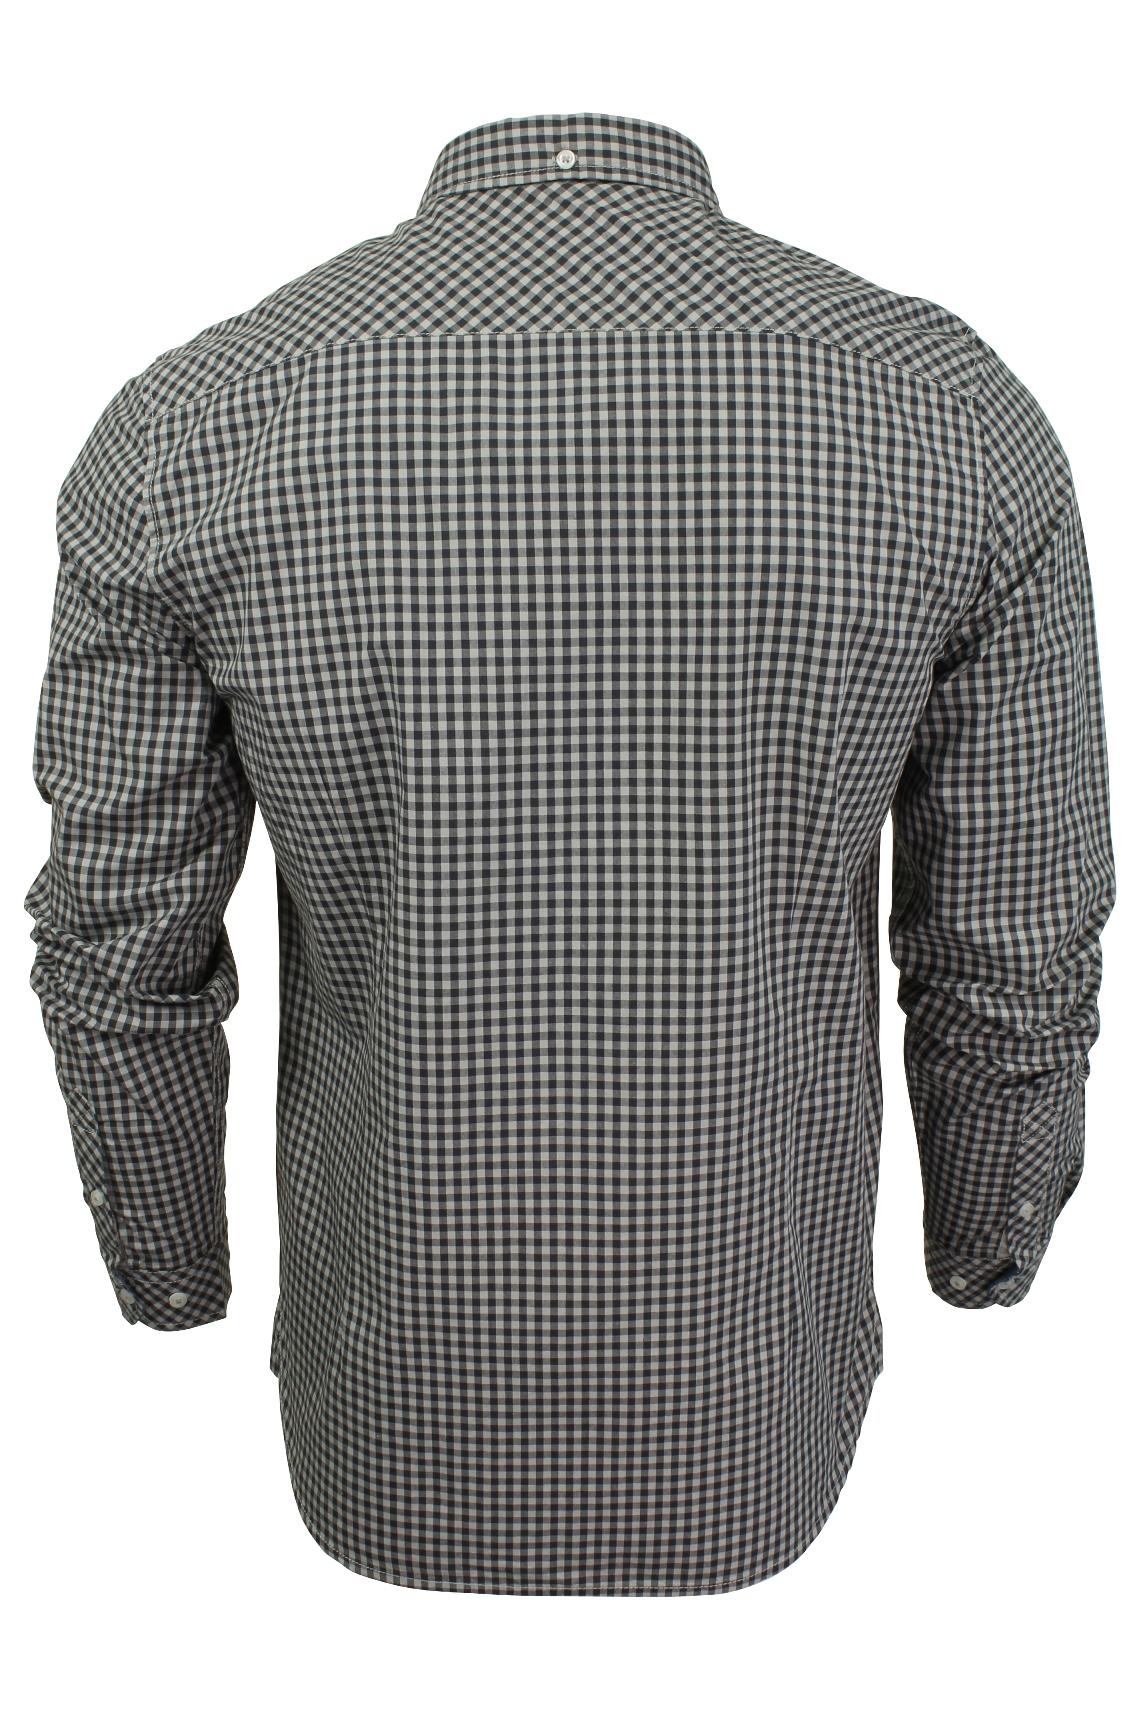 Mens-Gingham-Check-Shirt-by-Tokyo-Laundry-039-Newick-039-Long-Sleeved thumbnail 5